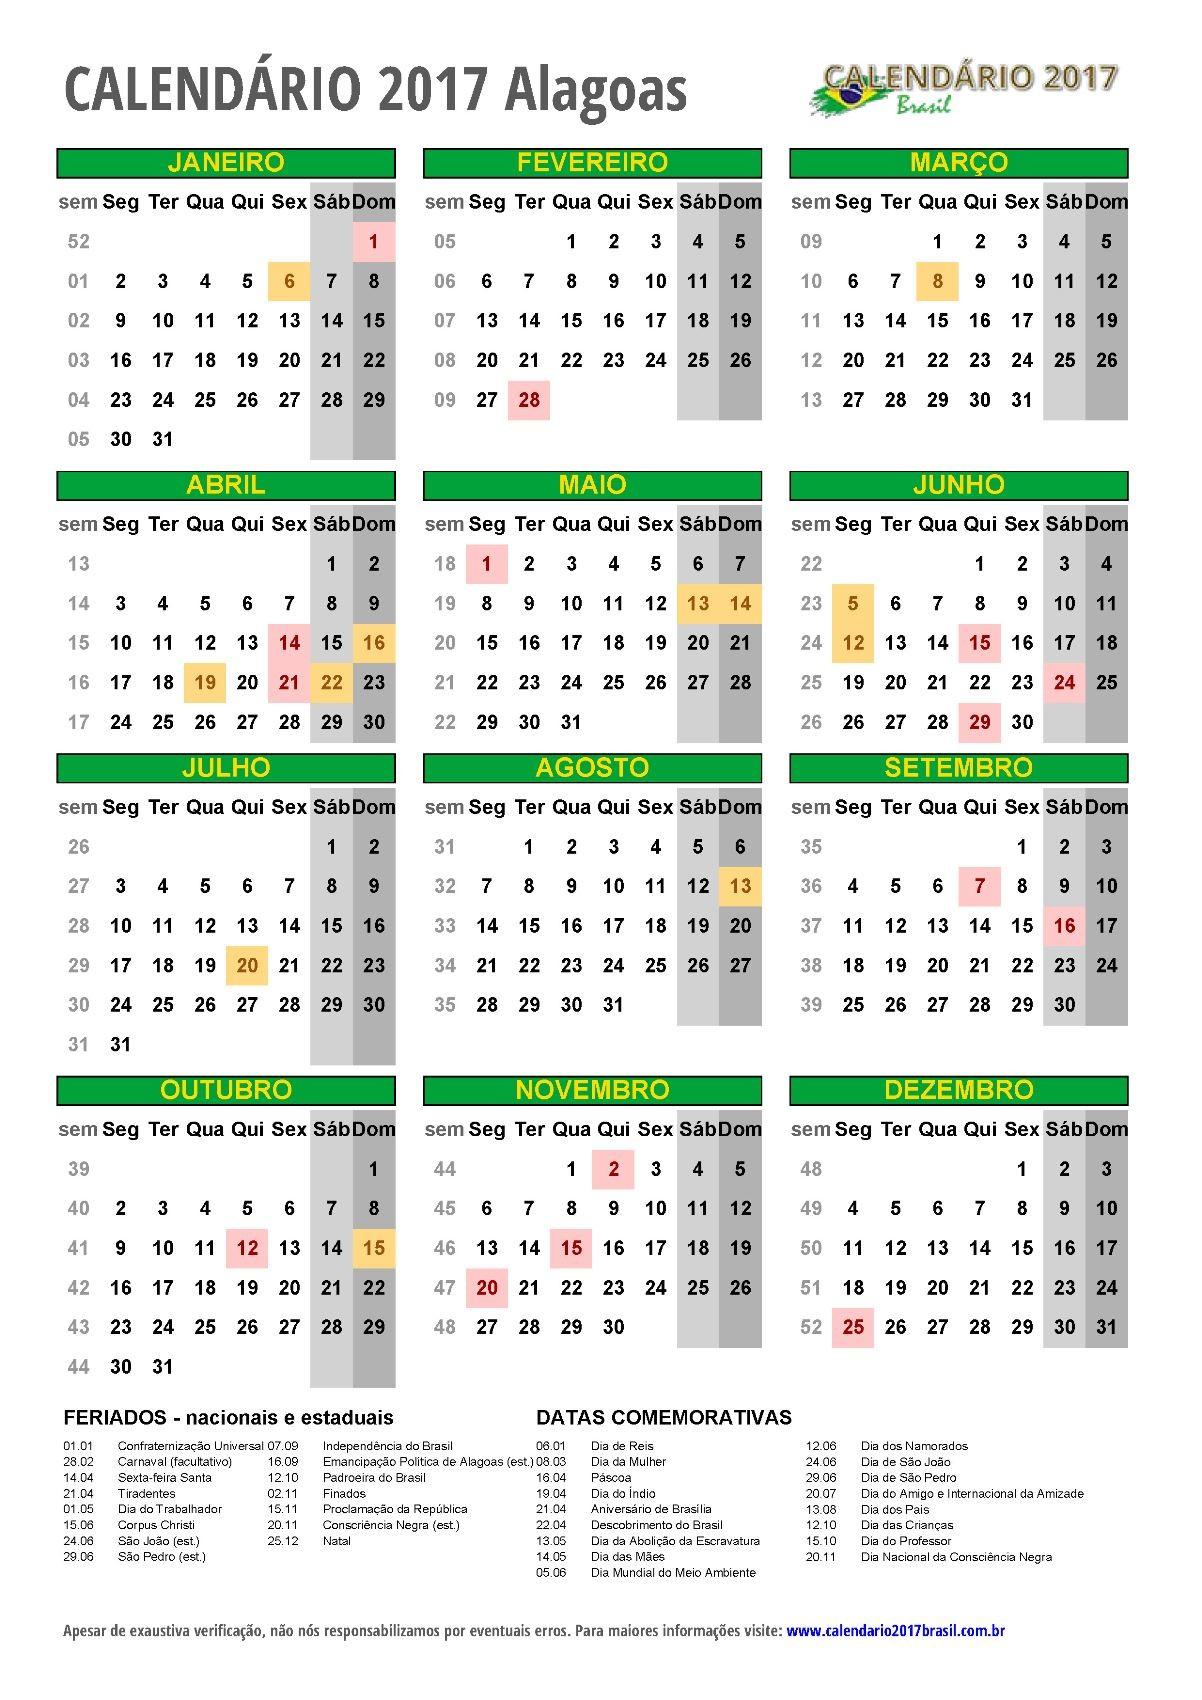 excellent calendrio gratuito sereismos stunning imprimir calendario interesting calendario enero para